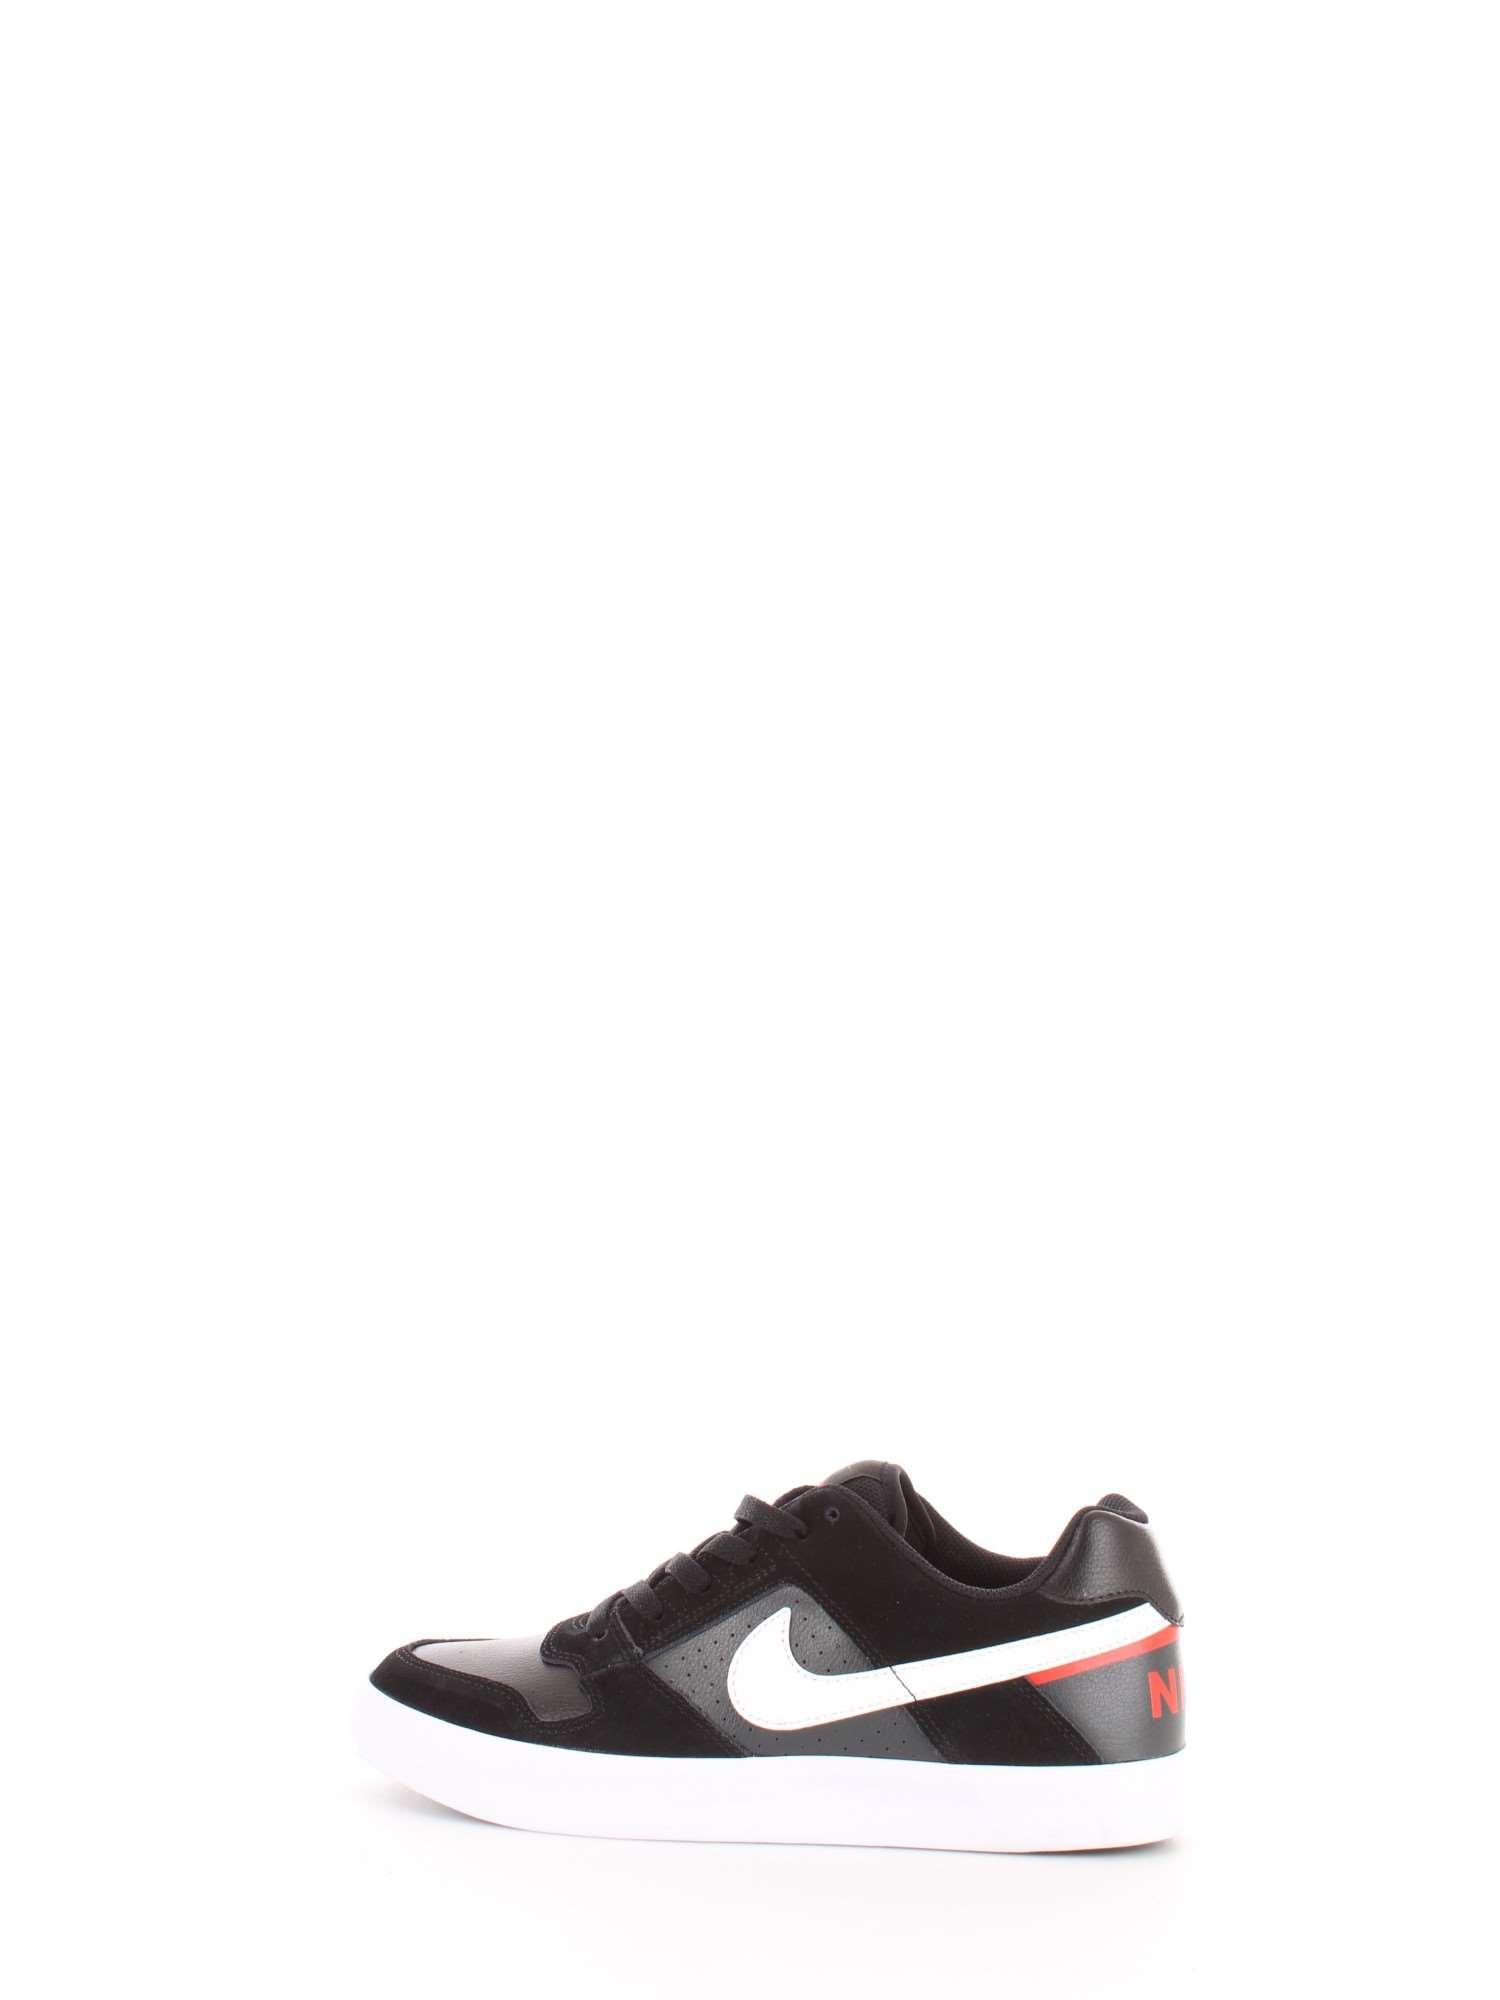 Nike Sneakers Sintetico Bianco Max1980 942237 Nero wNn80vm